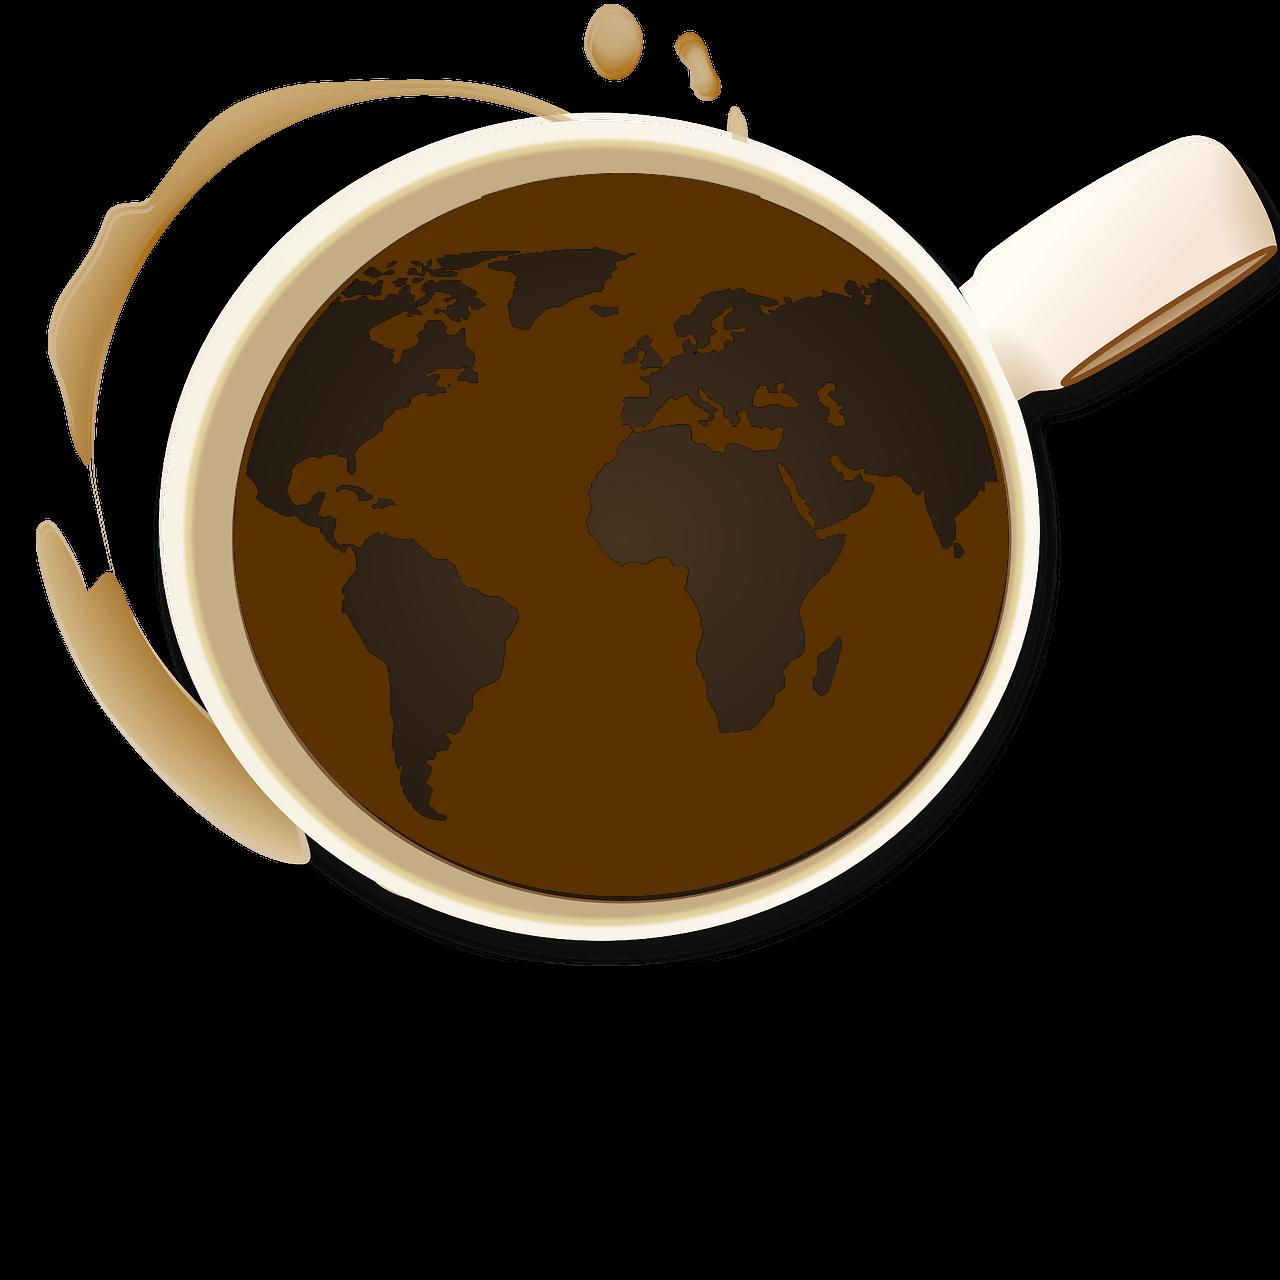 Blogi jezykowe i kulturowe